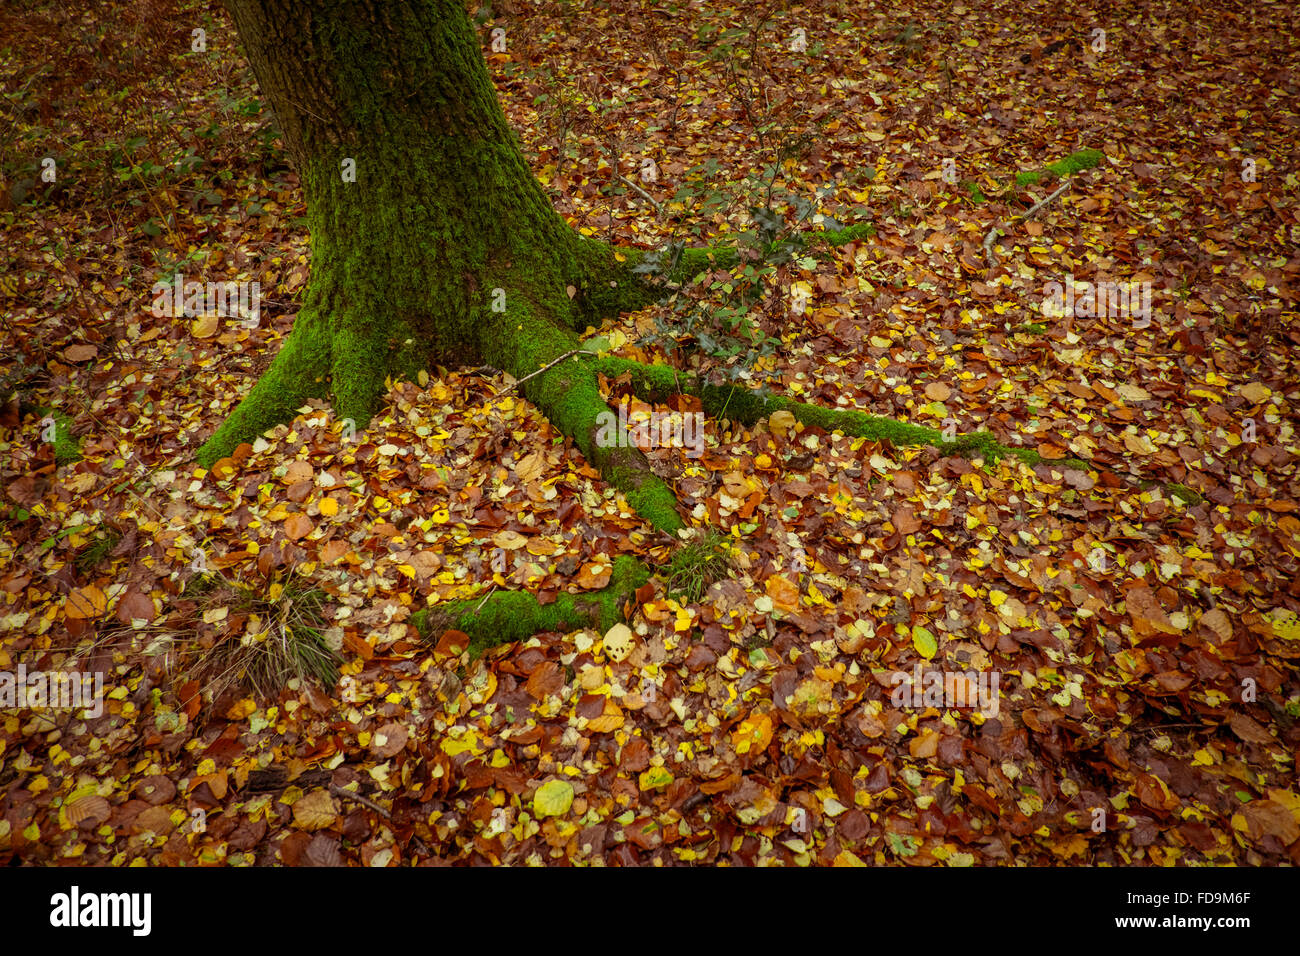 Walkways through Beech tress in an Autumn Forest Stock Photo